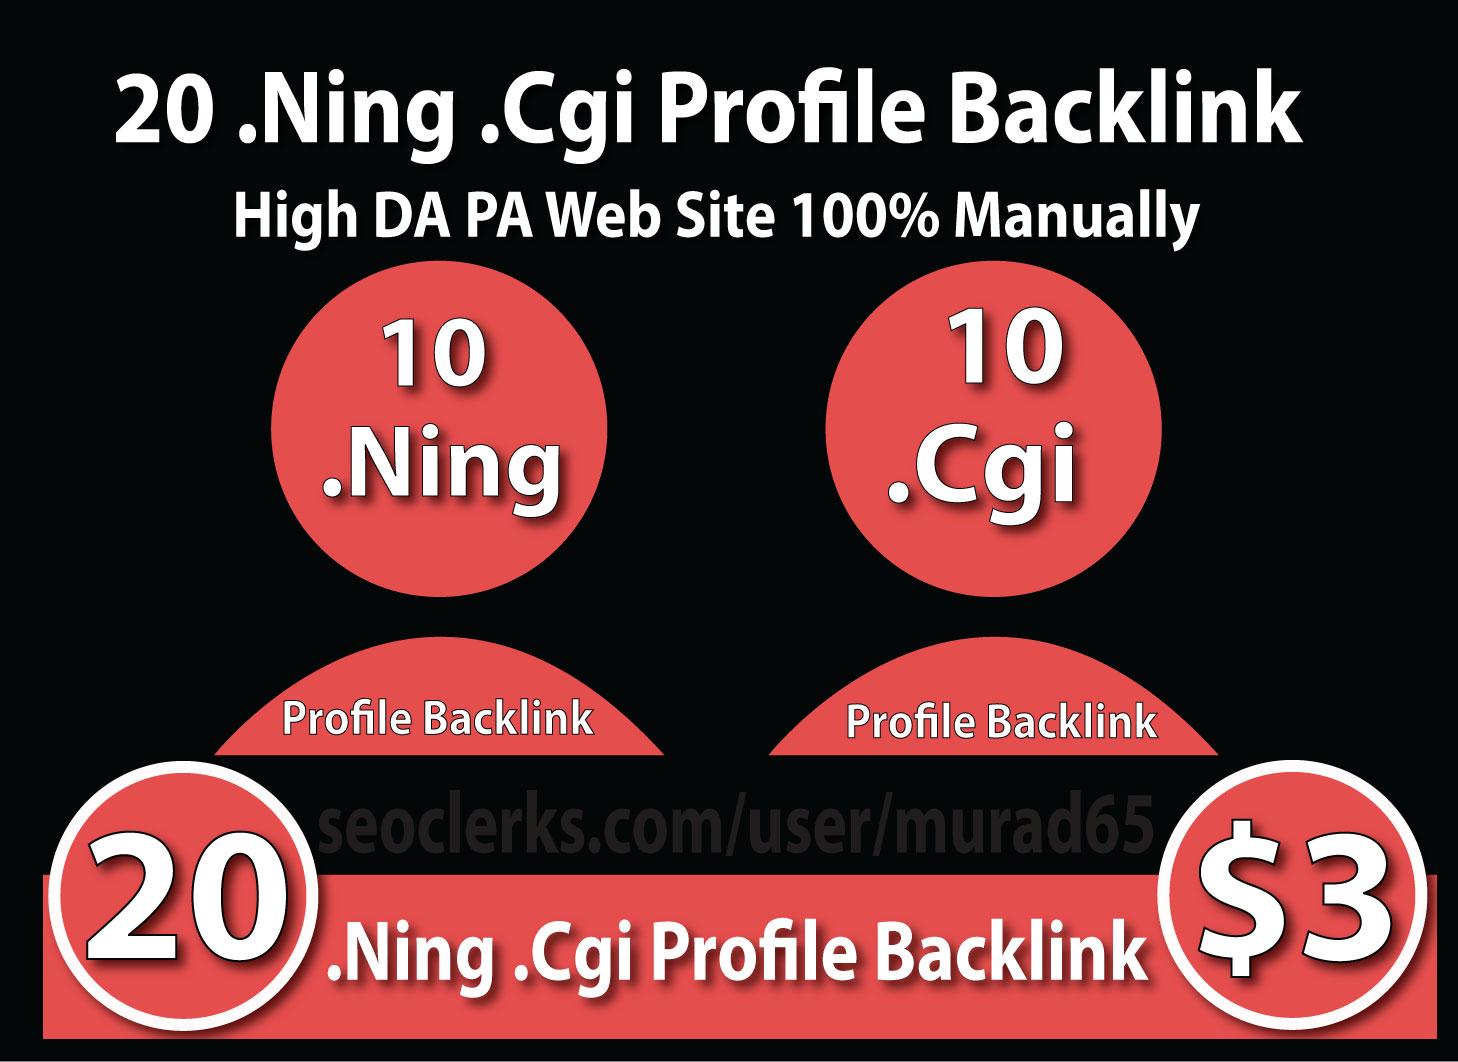 20 Profile Backlink .Ning .Cgi High DA PA Site Hand Made